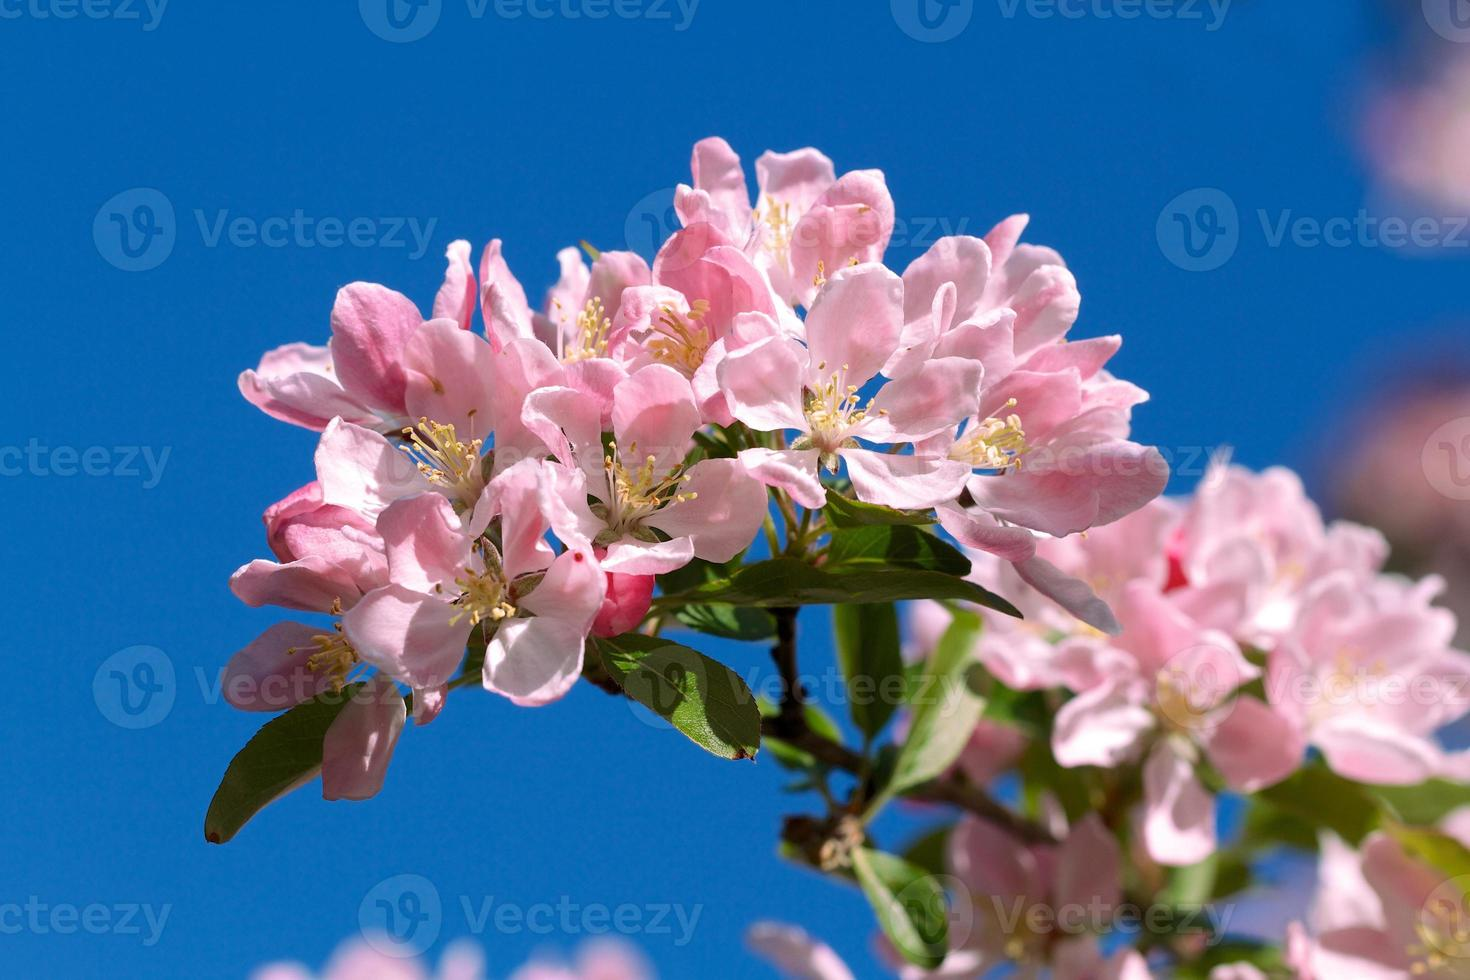 rosa Blüten gegen einen blauen Himmel foto